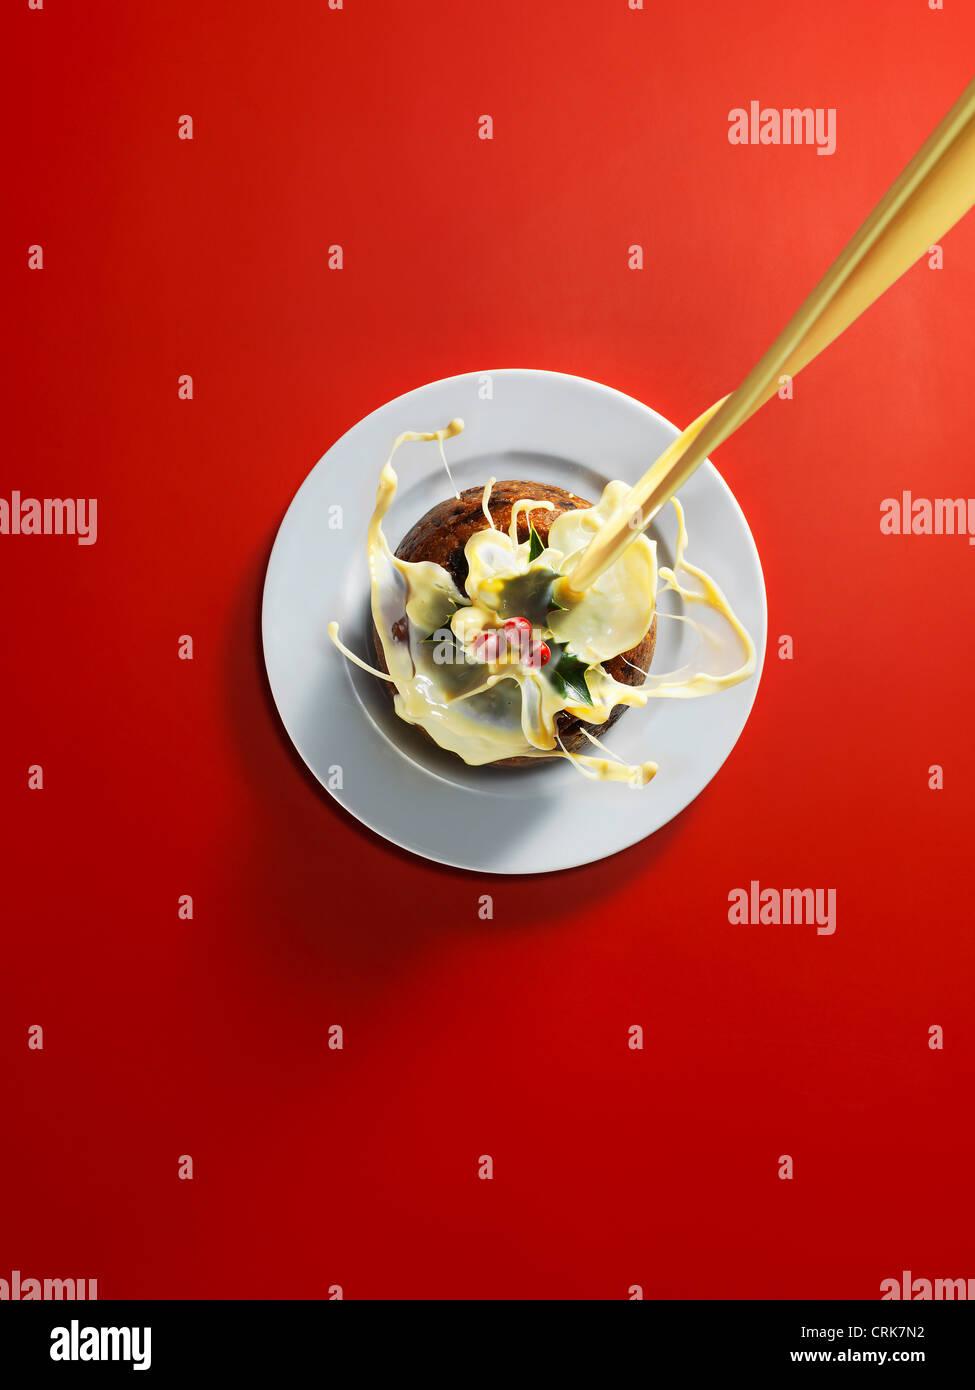 Cream pouring onto Christmas cake - Stock Image